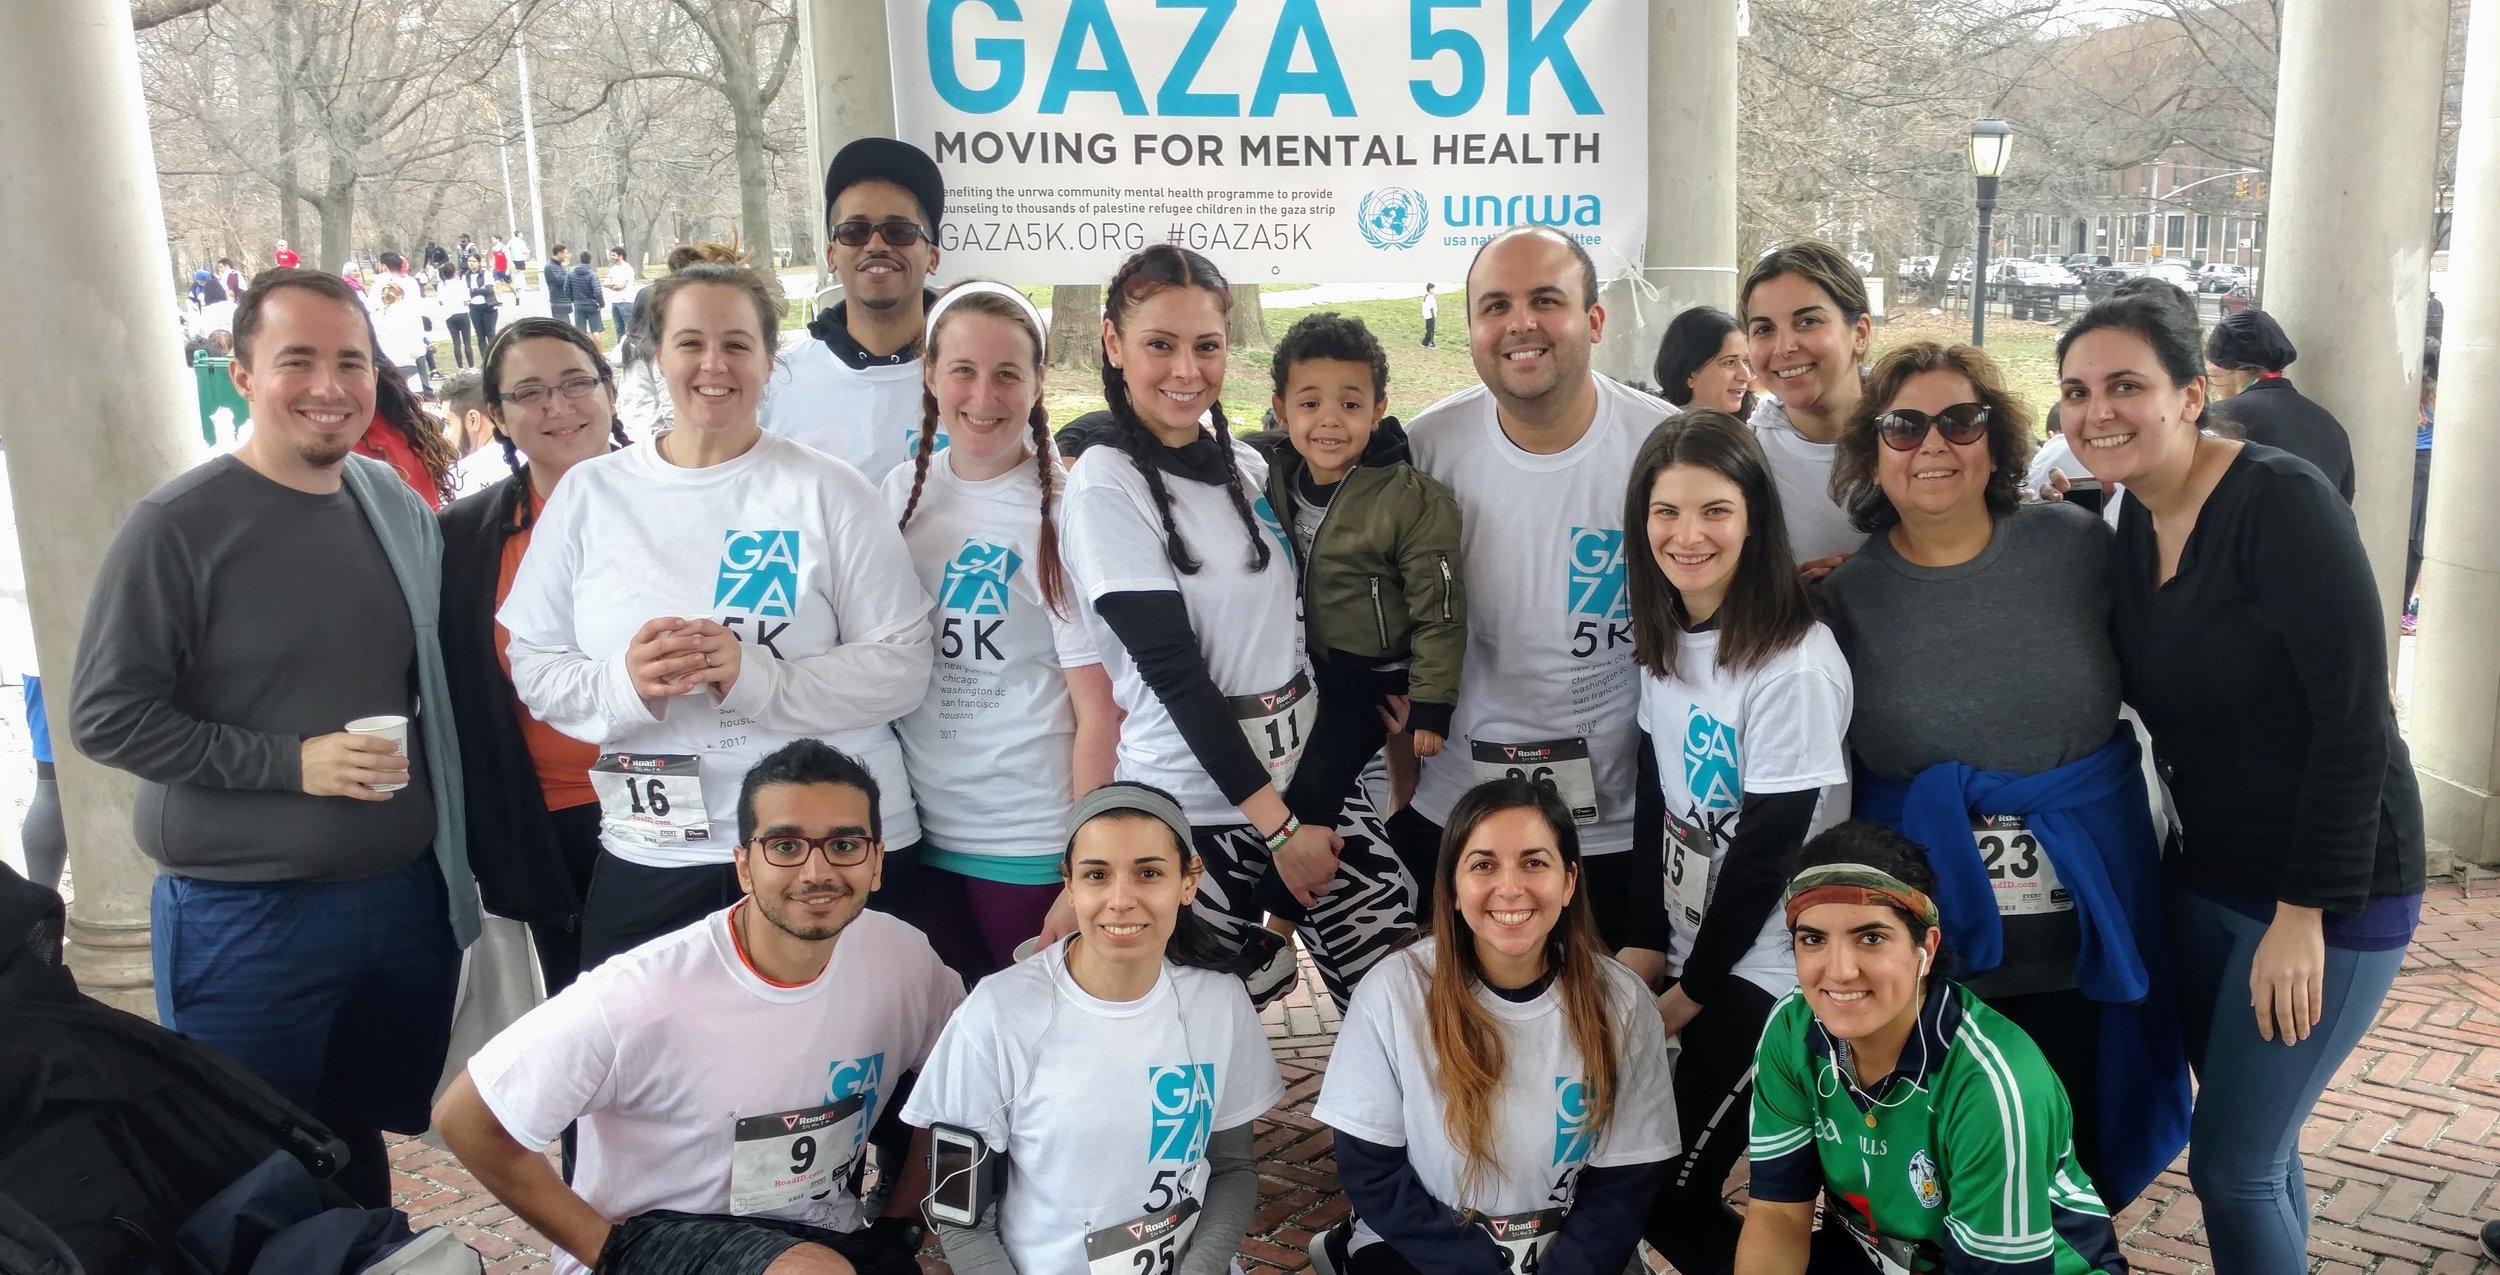 Members of Team Olive Gaza (in no particular order):Khalid (captain), Yasmin, Dalia, Fatena, Dina